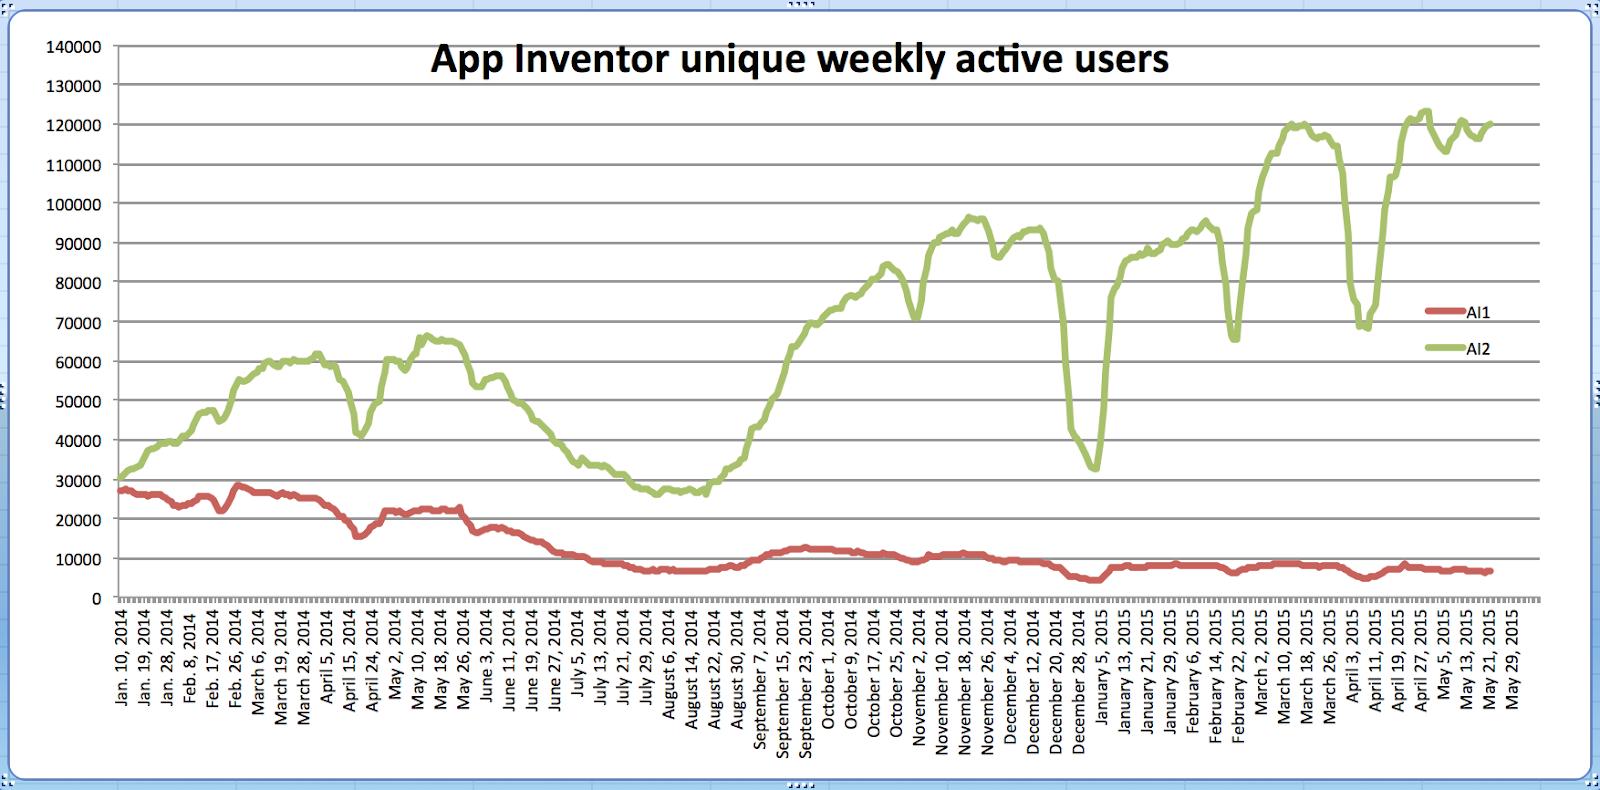 MIT App Inventor usage triples during 2014-2015 school year